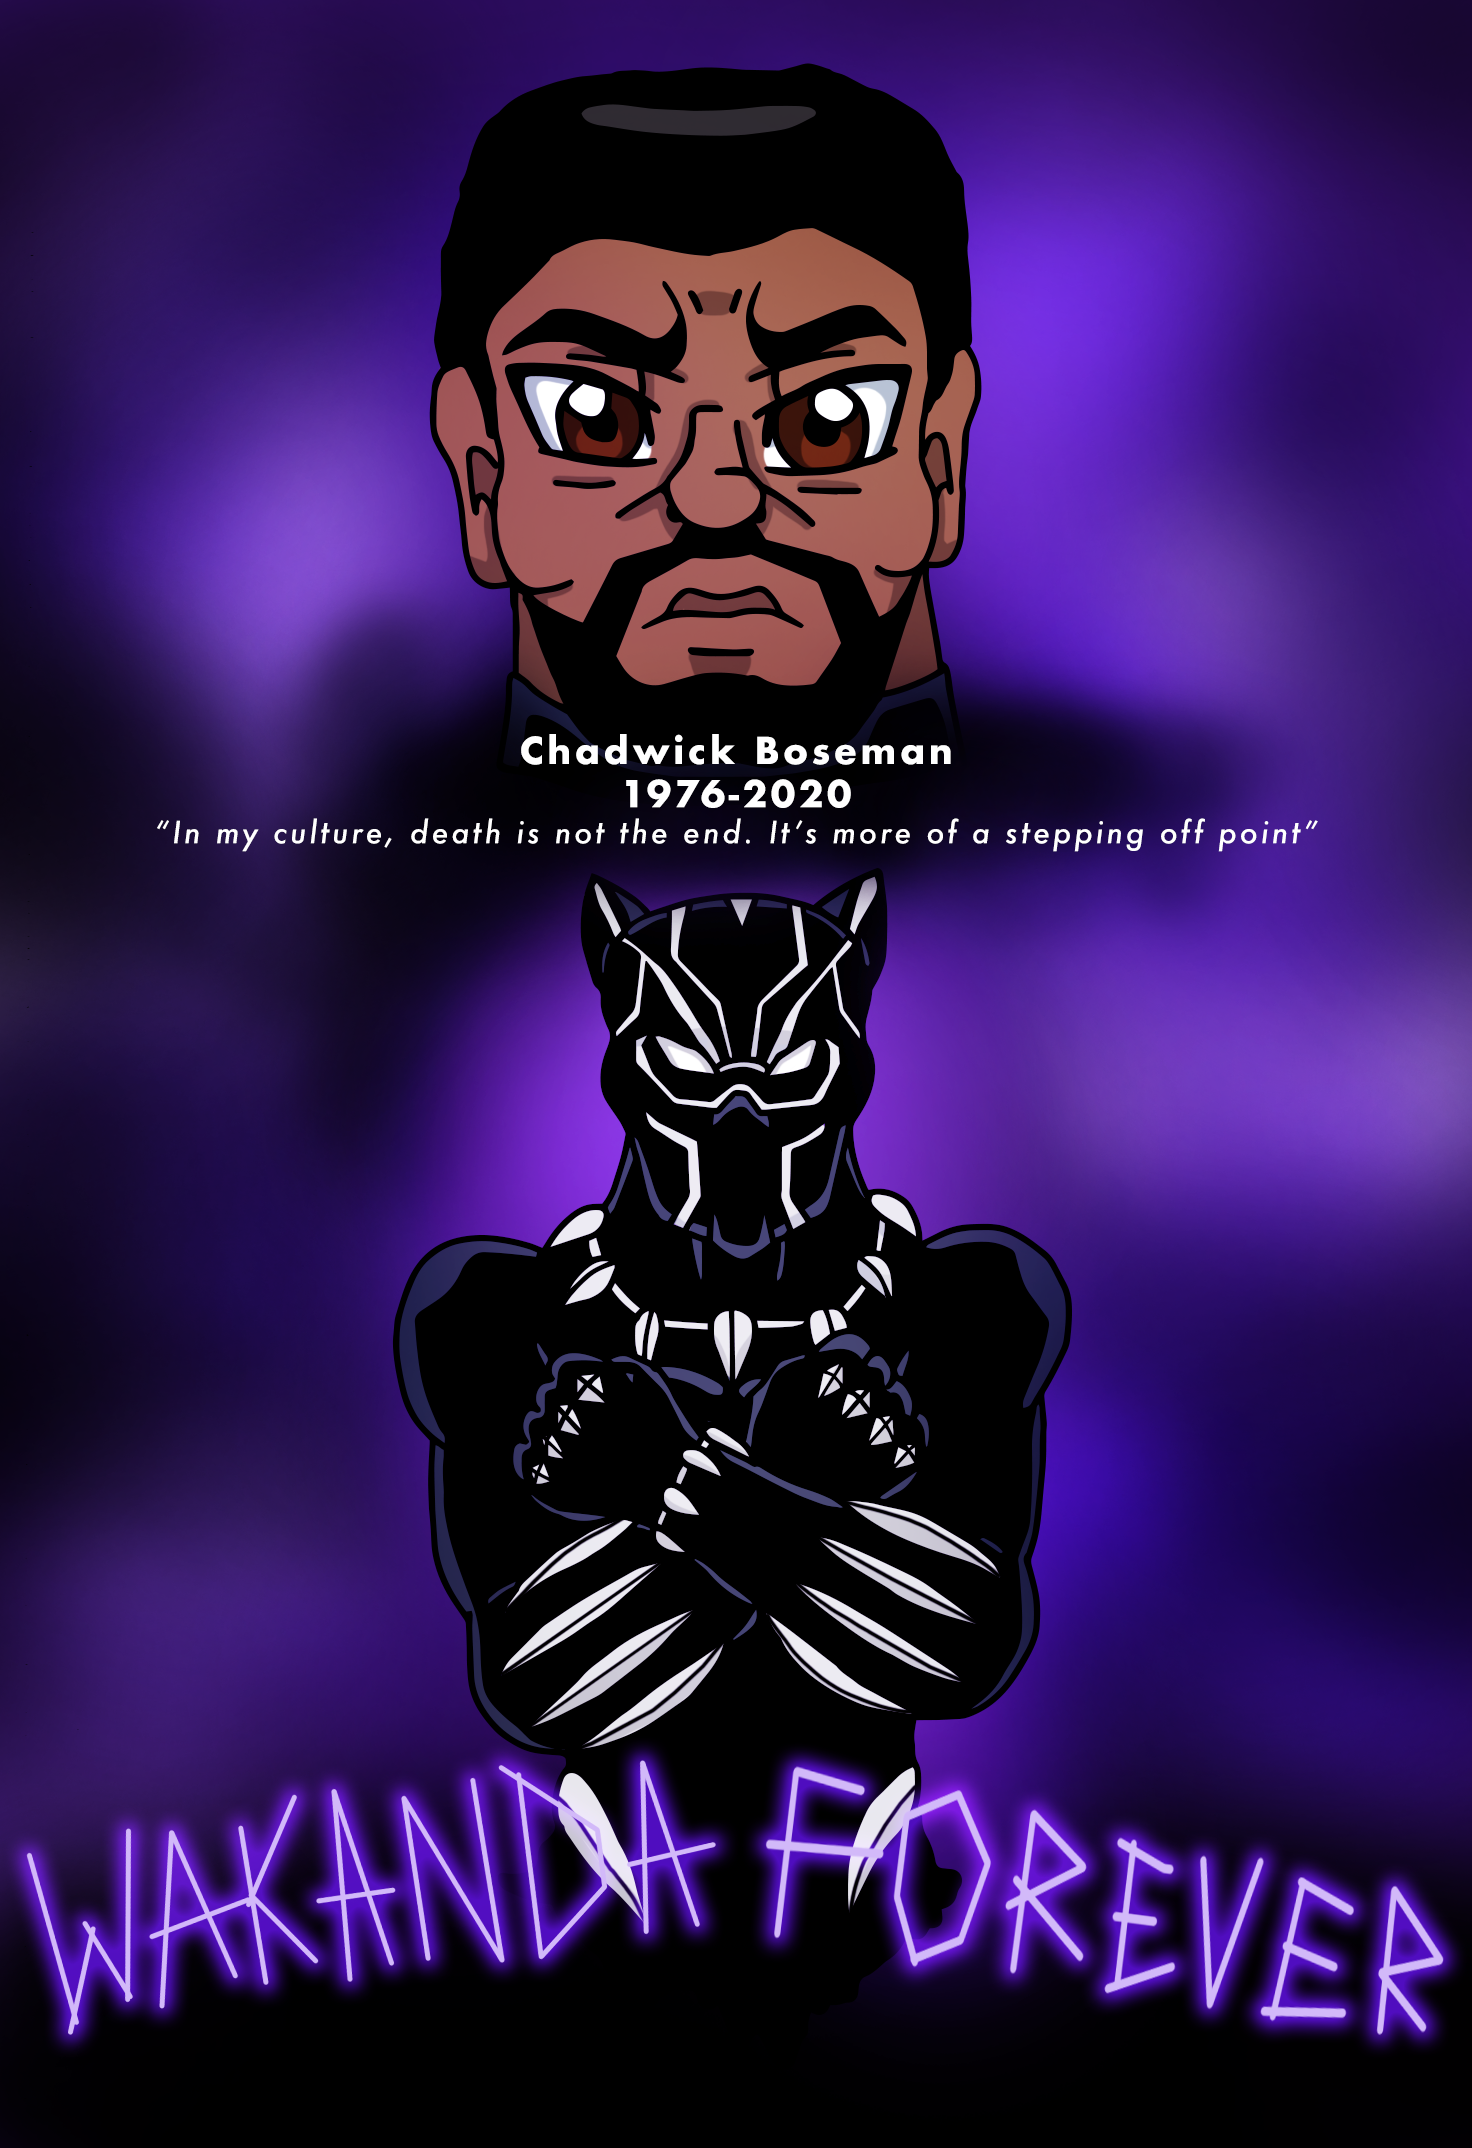 Wakanda Forever Tribute To Chadwick Boseman By Edcom02 On Deviantart